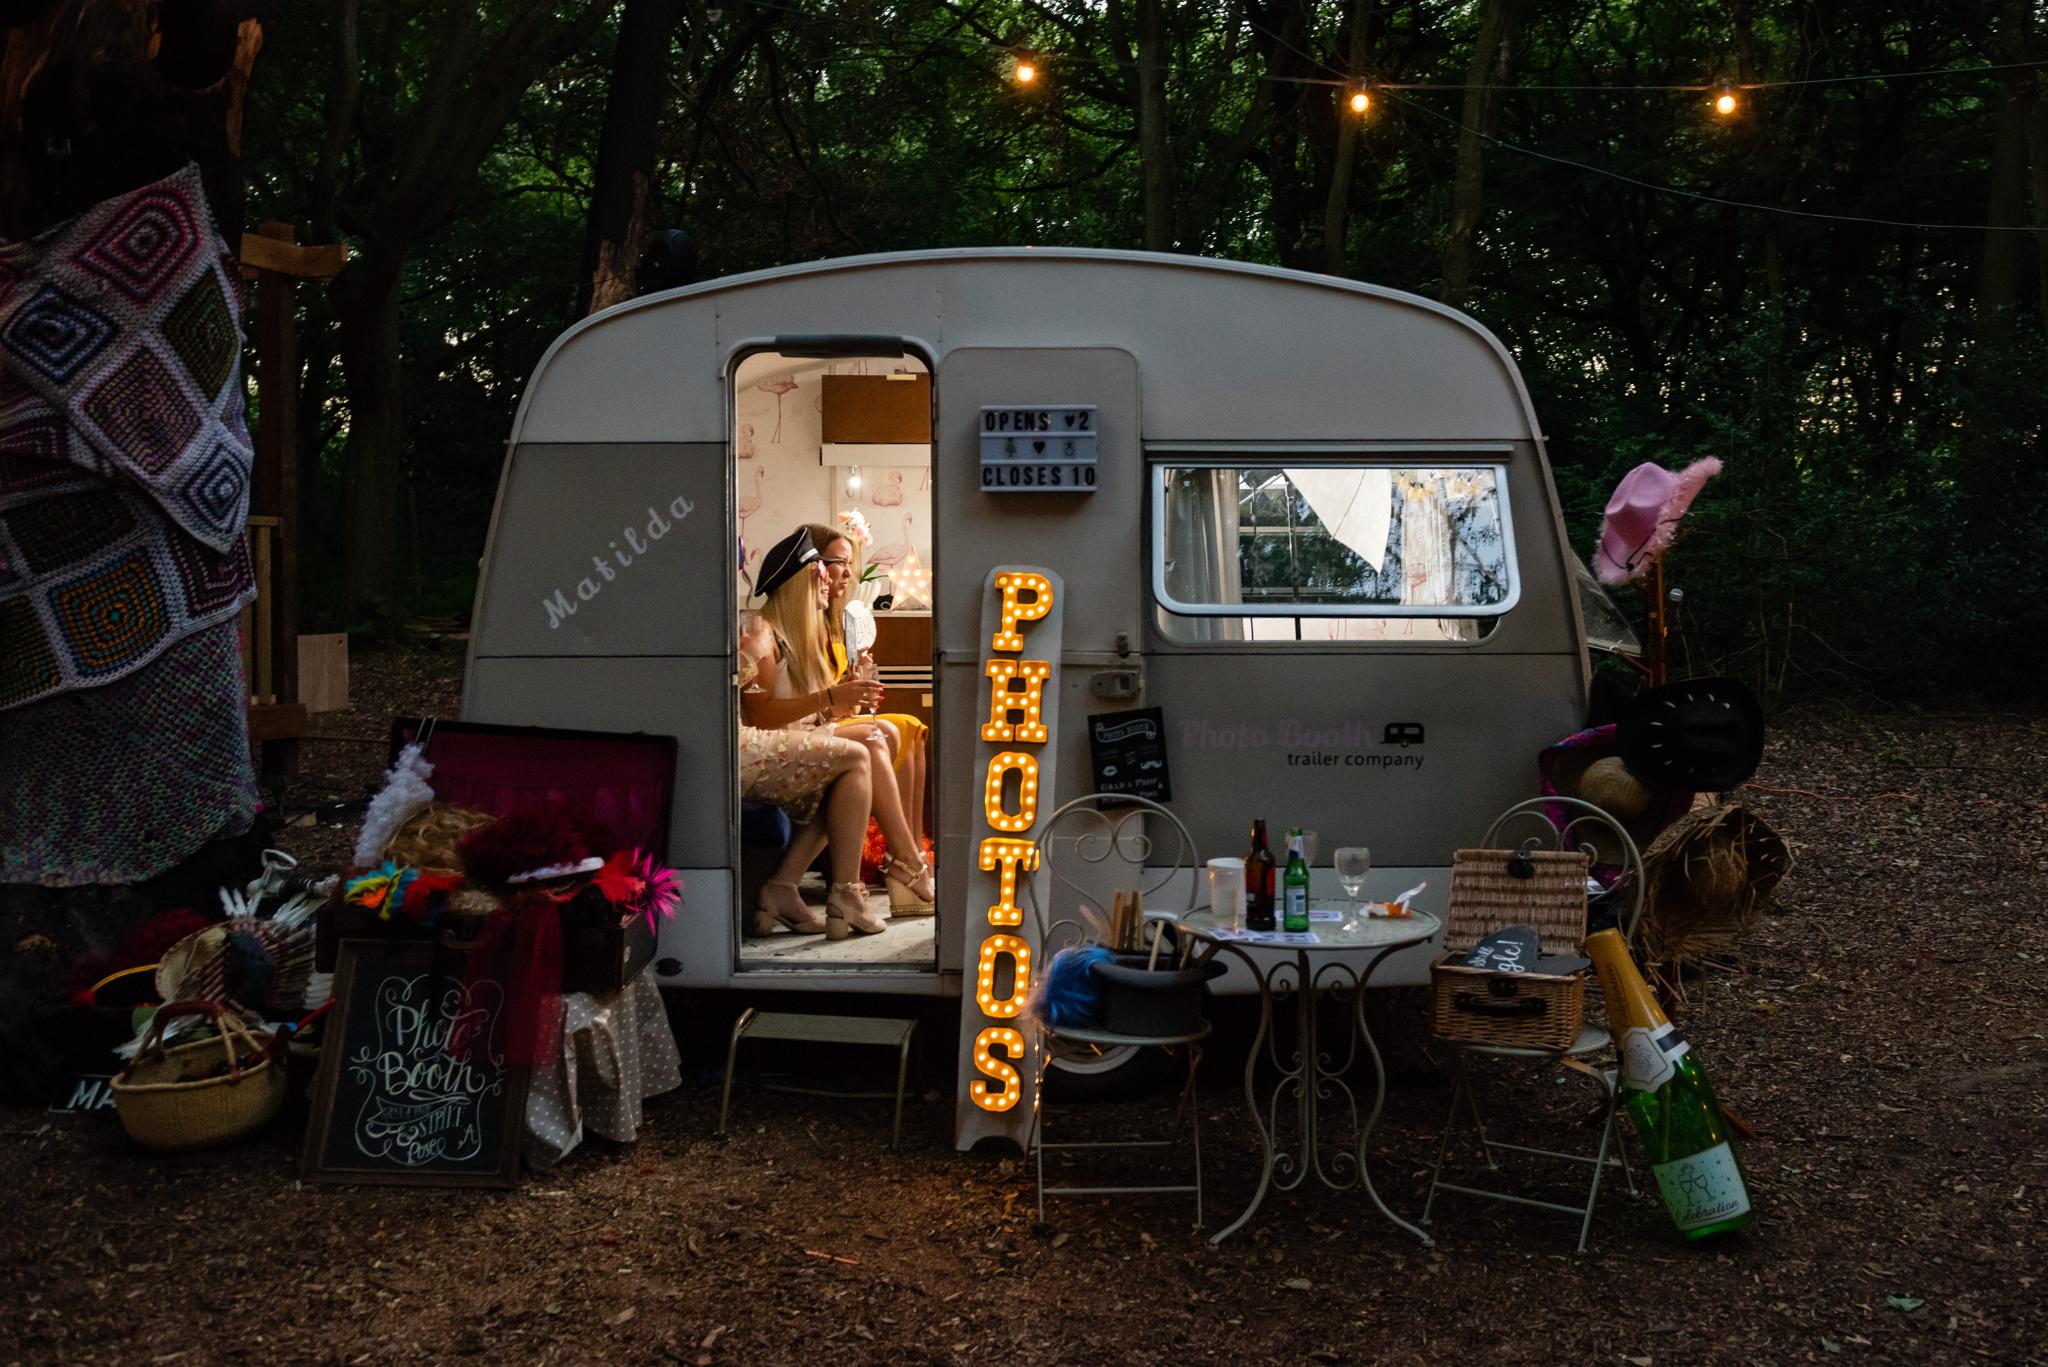 A caravan photo booth